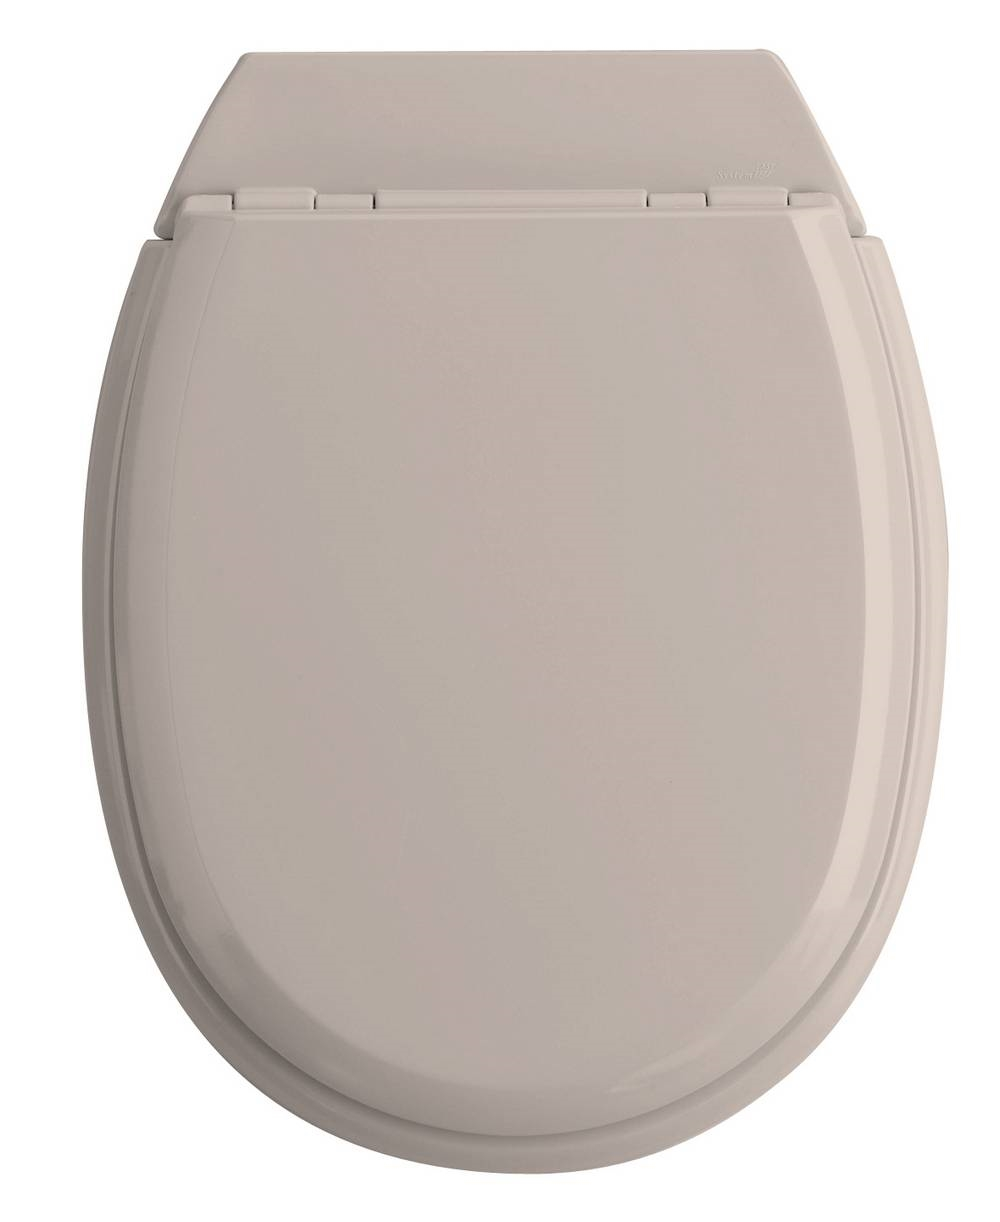 ATLAS - WC-zitting - Glanzend Licht Taupe